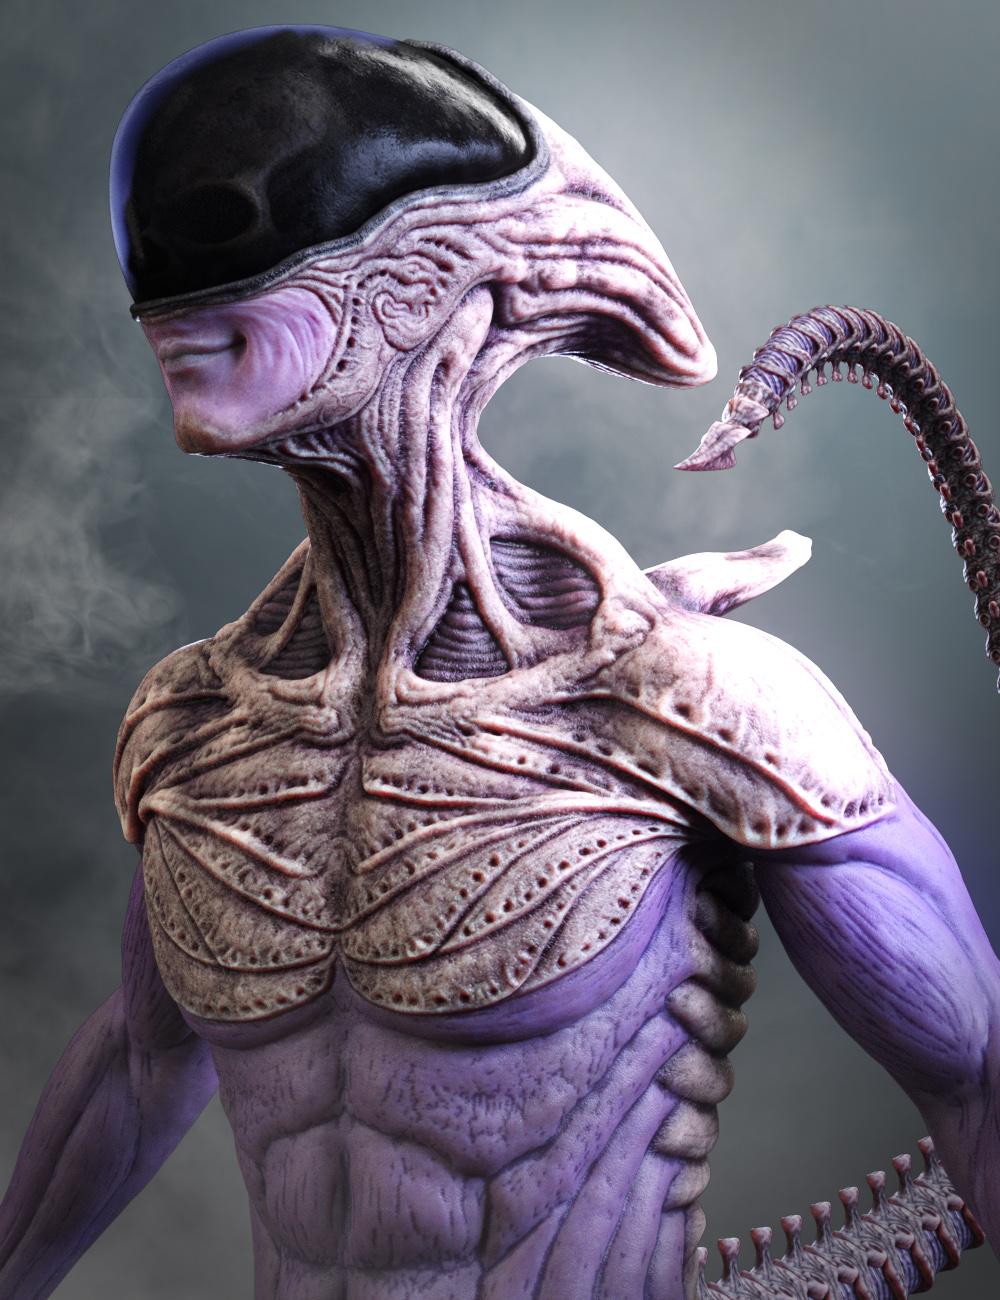 Mysterious Alien HD for Genesis 8 Male by: JoLab1985, 3D Models by Daz 3D